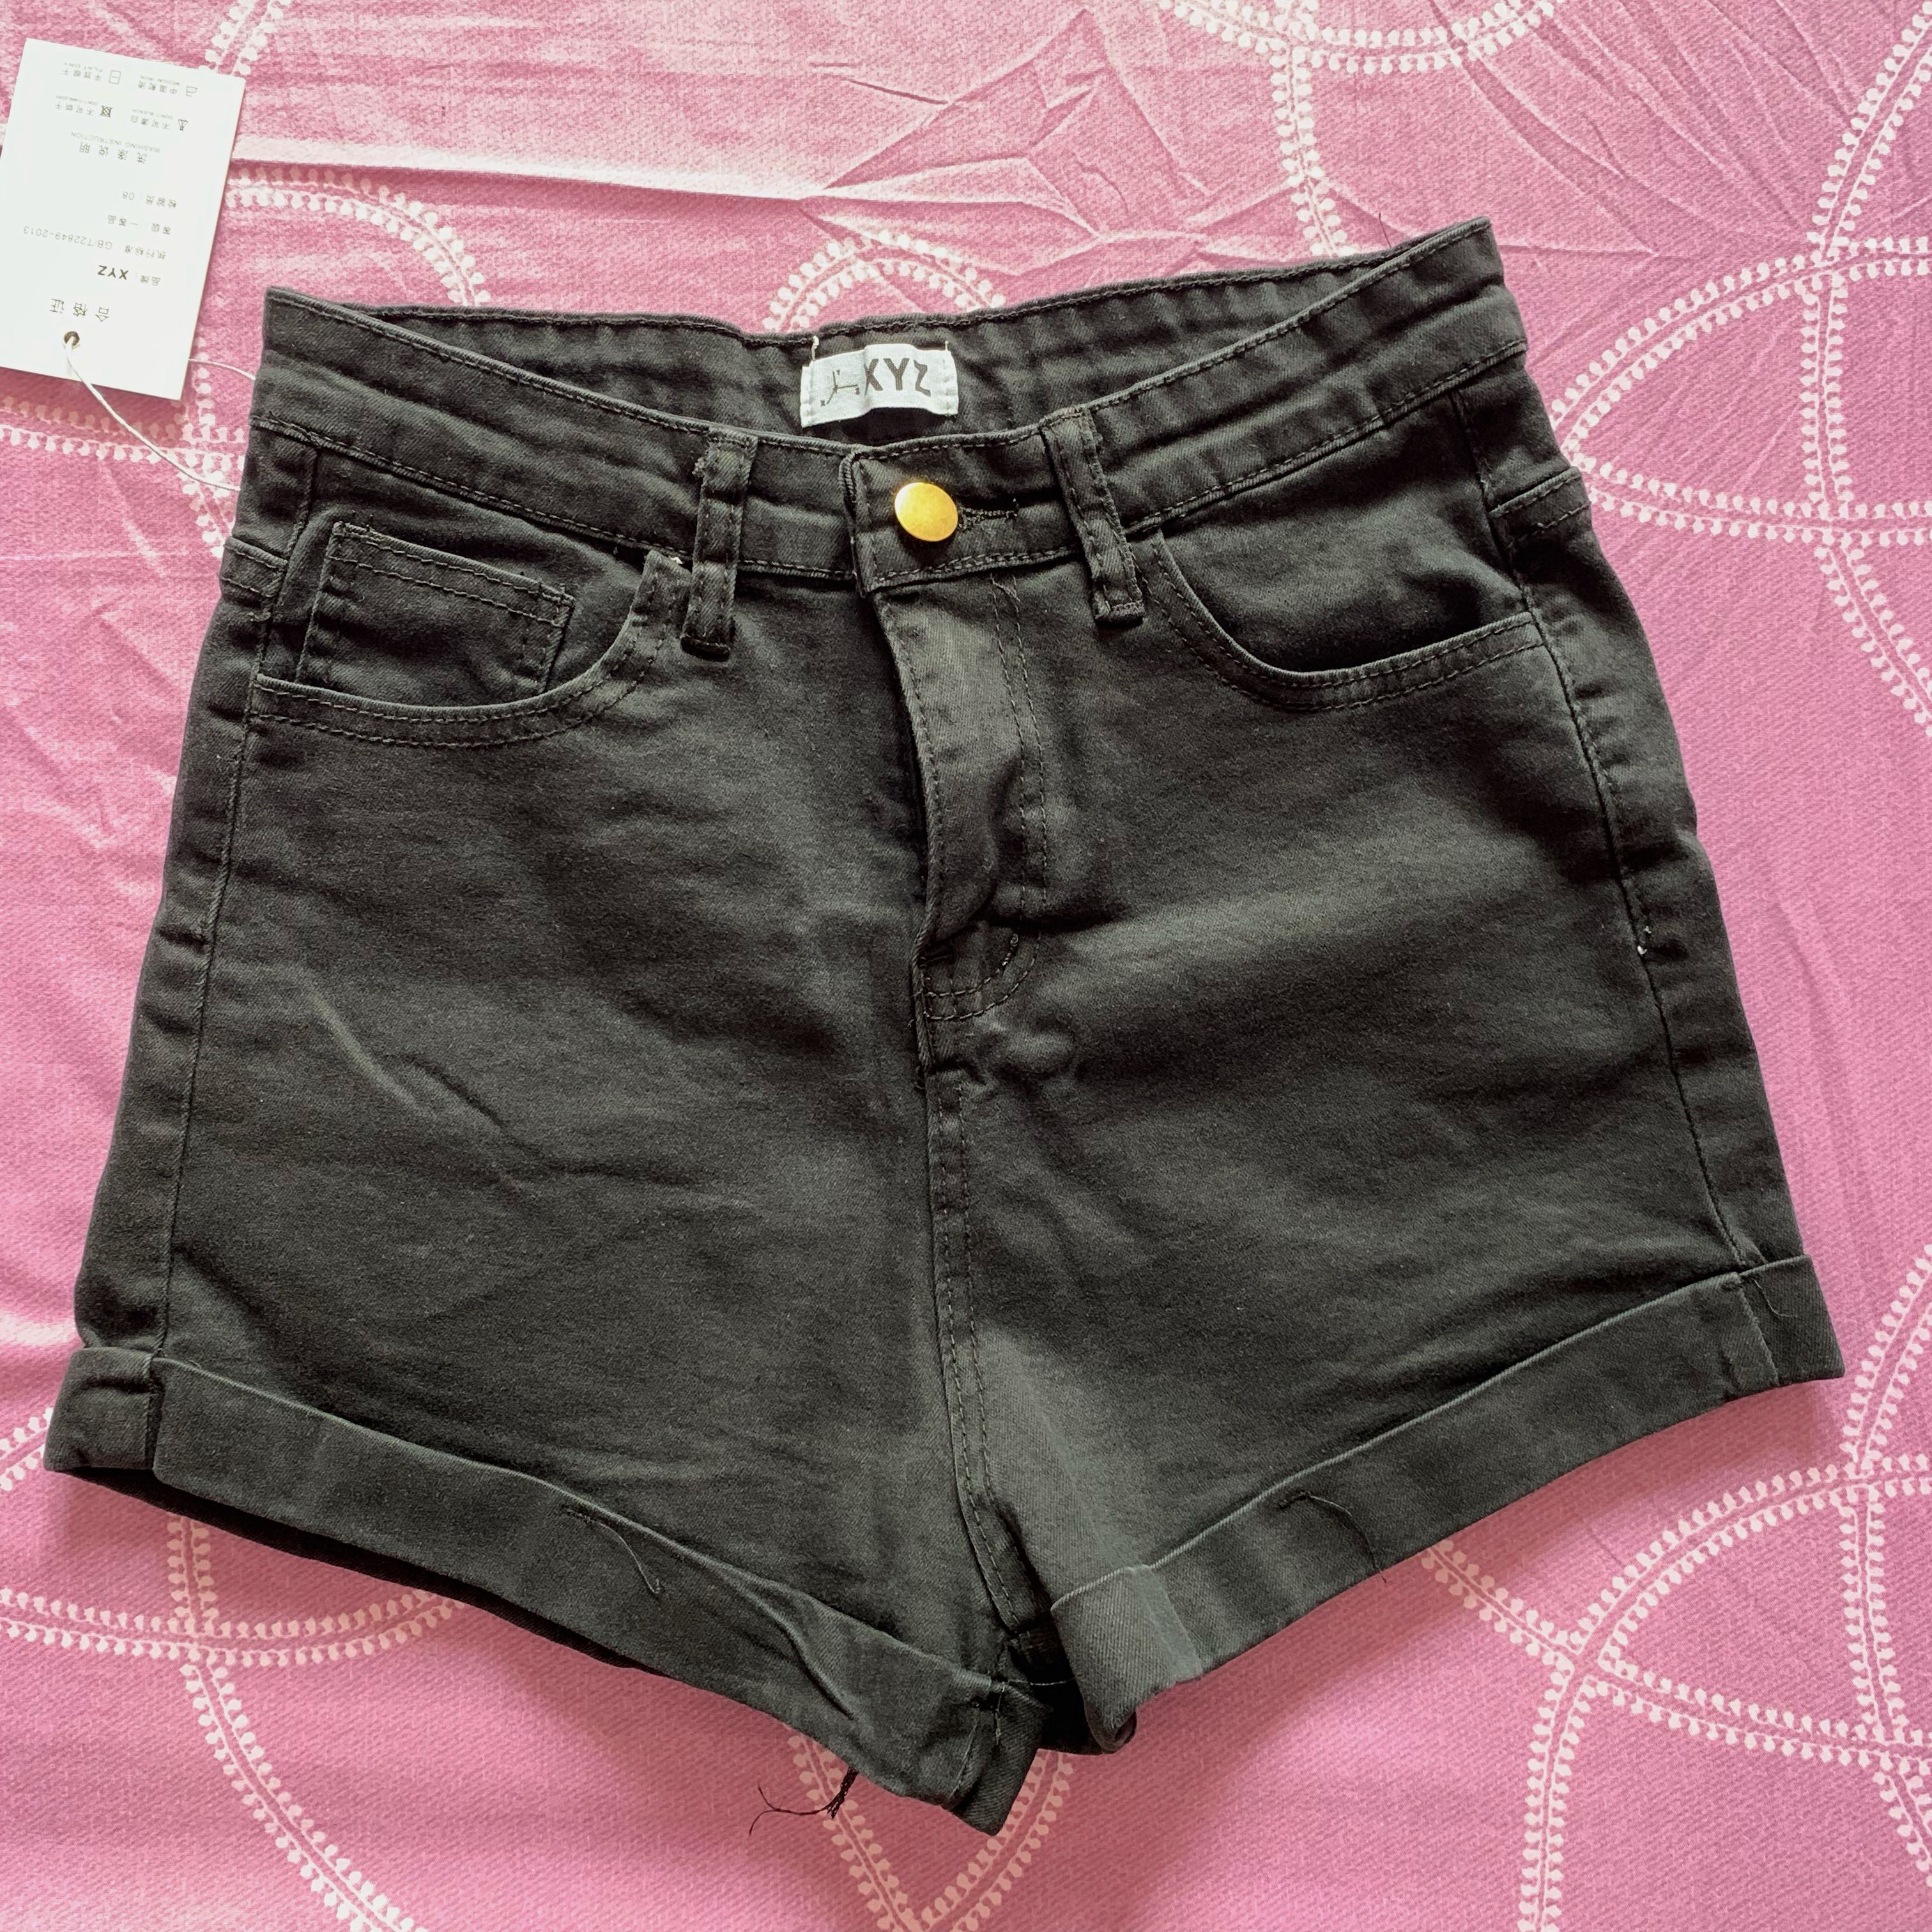 fa513a873be black high waist shorts, Women's Fashion, Clothes, Pants, Jeans ...